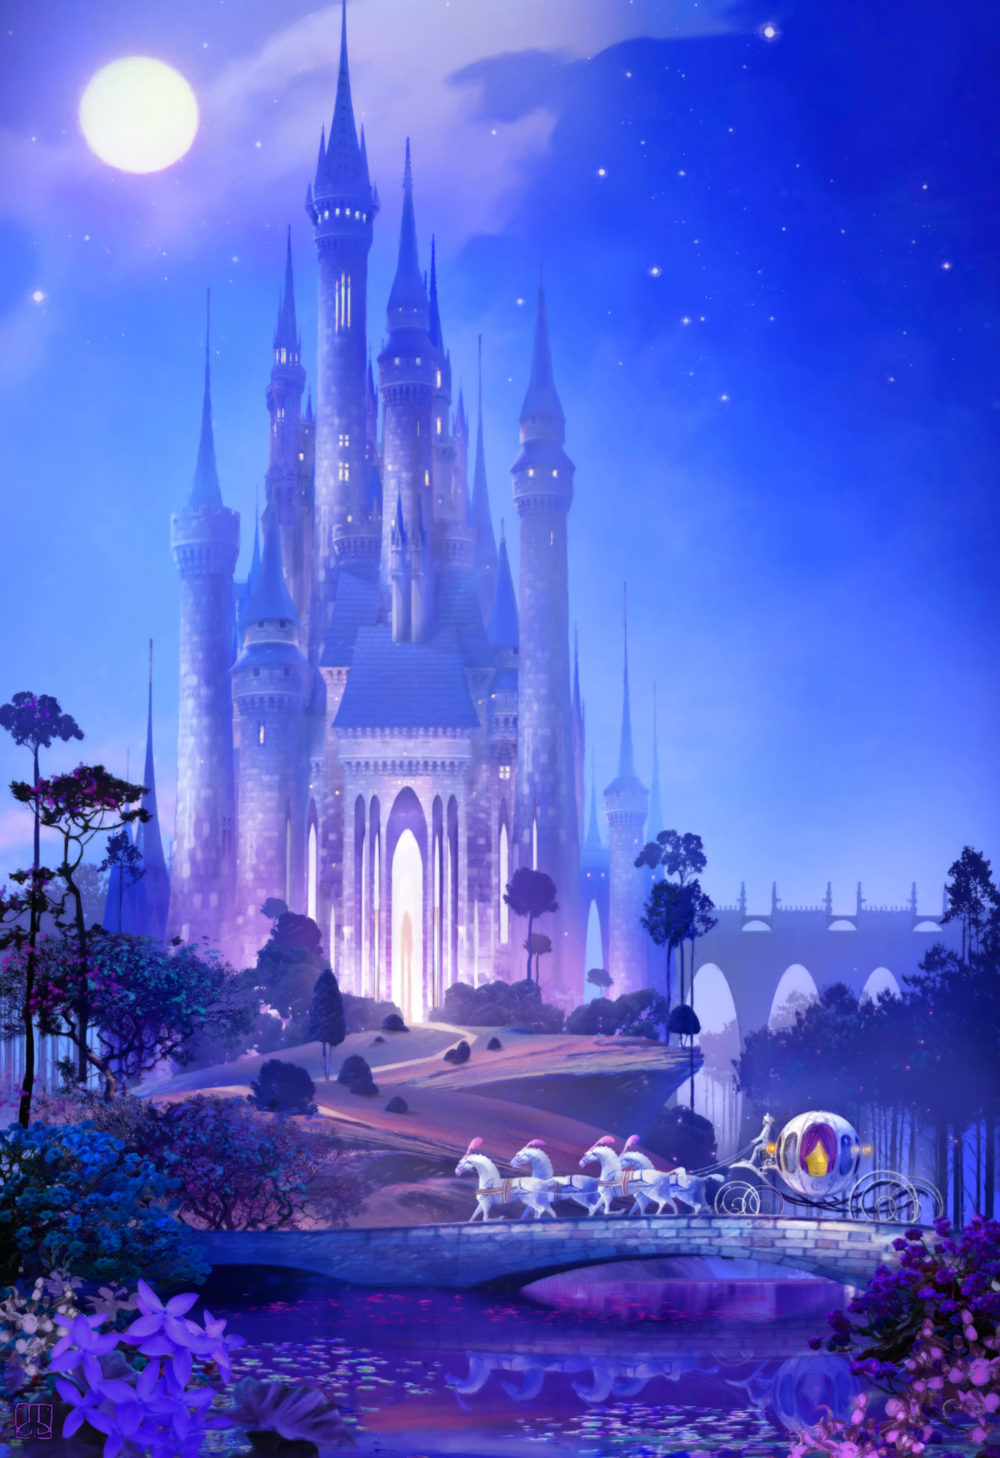 A Wonderful Dream Comes True Png Wallpaper Iphone Disney Disney Wallpaper Disney Aesthetic